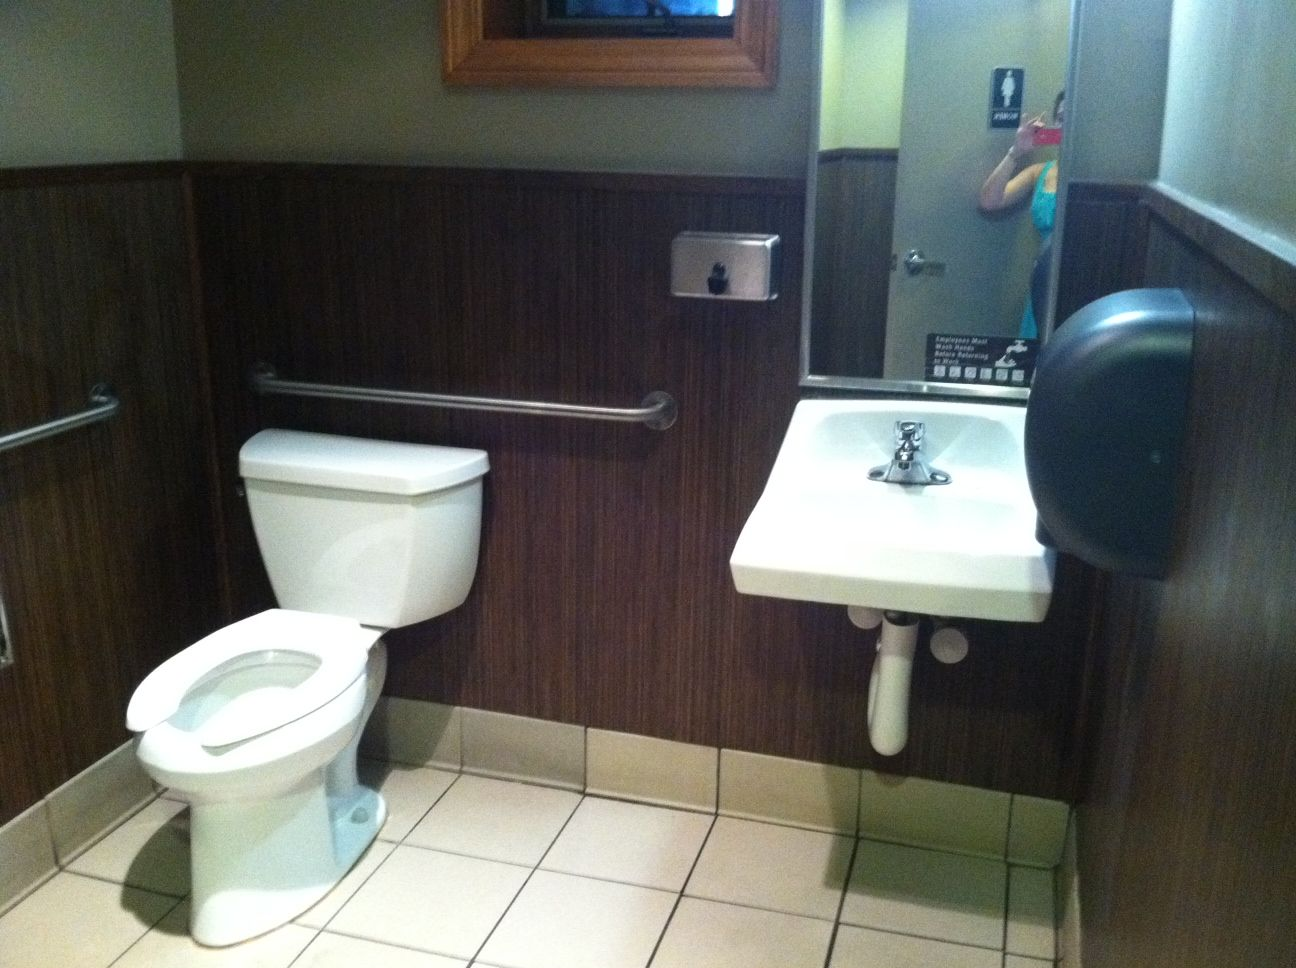 Starbucks Restroom Google Search Commercial Restroom